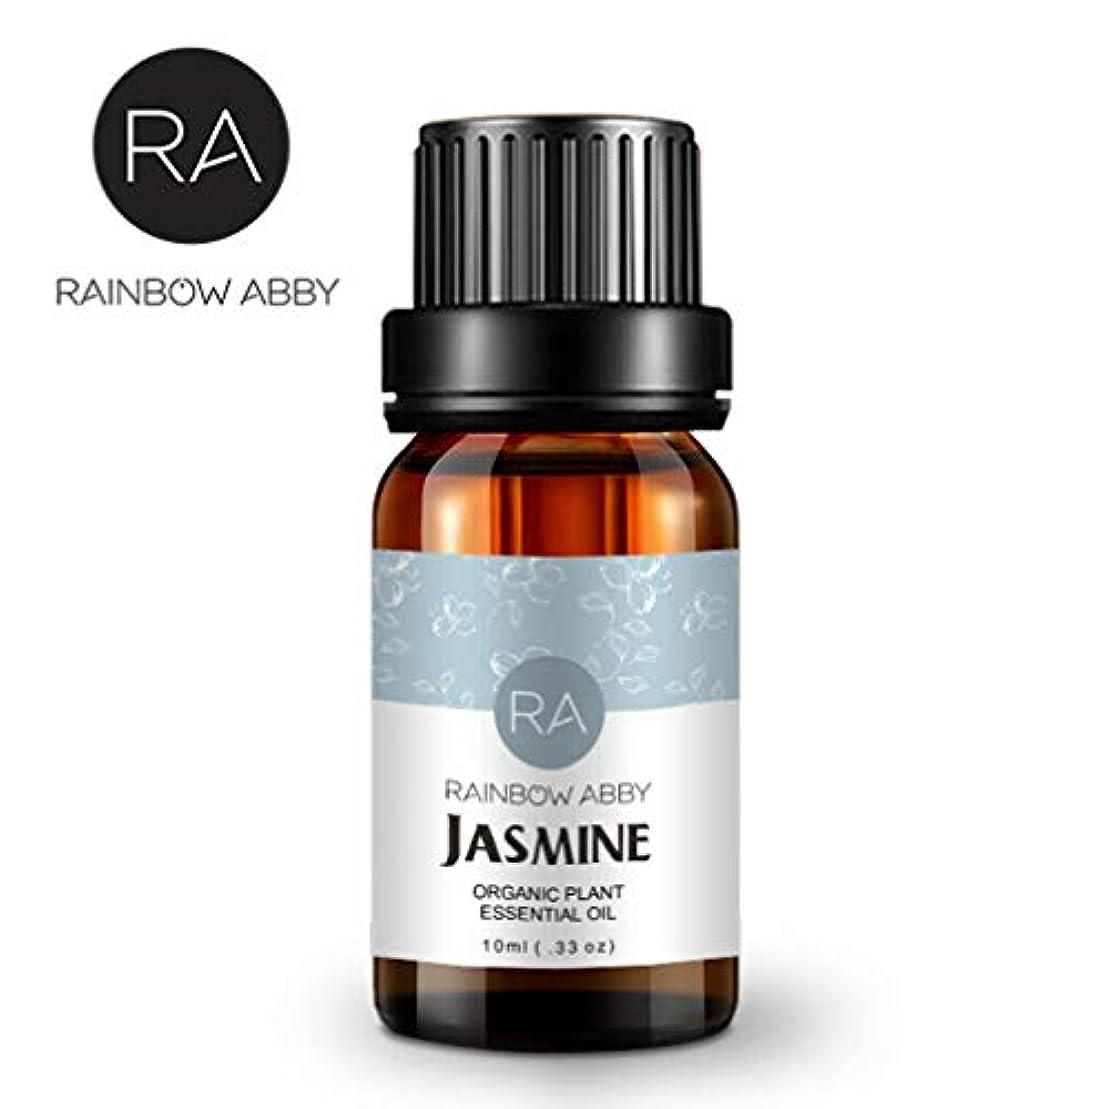 RAINBOW ABBY ジャスミン エッセンシャル オイル ディフューザー アロマ セラピー オイル 100% ピュアオーガニック 植物 エキスジャスミン オイル 10ML/0.33oz